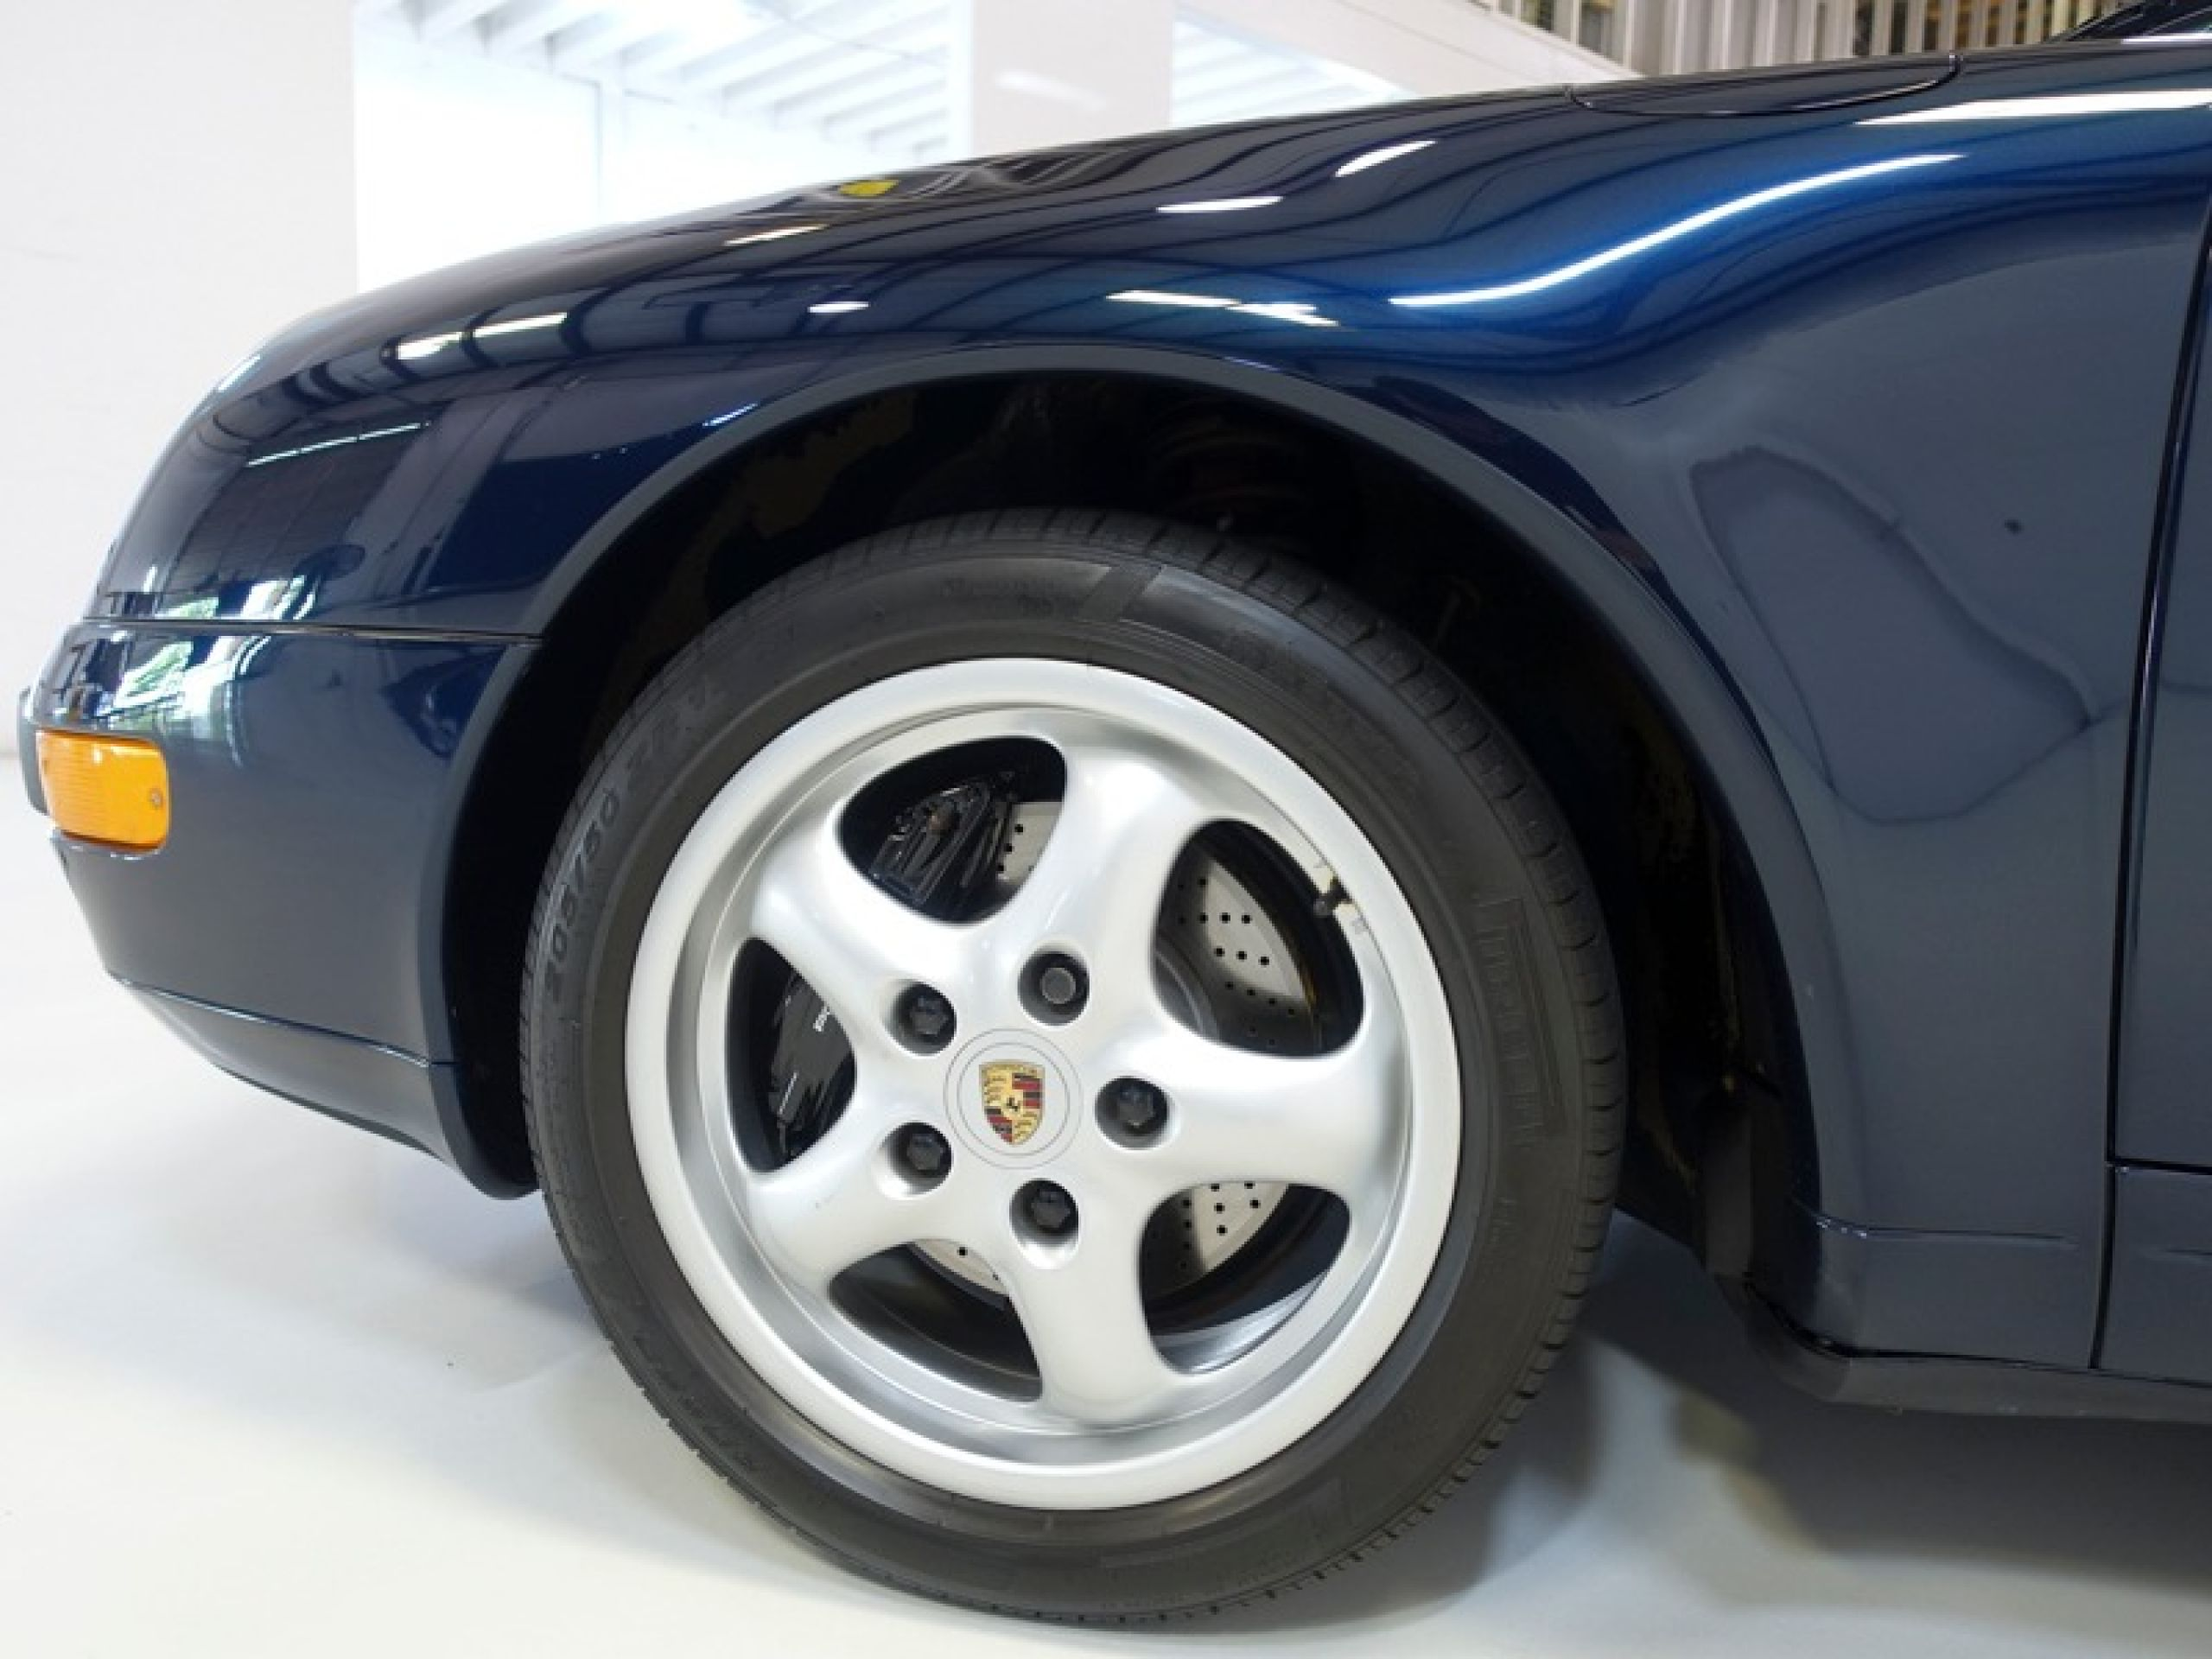 1997 Porsche 911 Carrera 2 Cabriolet